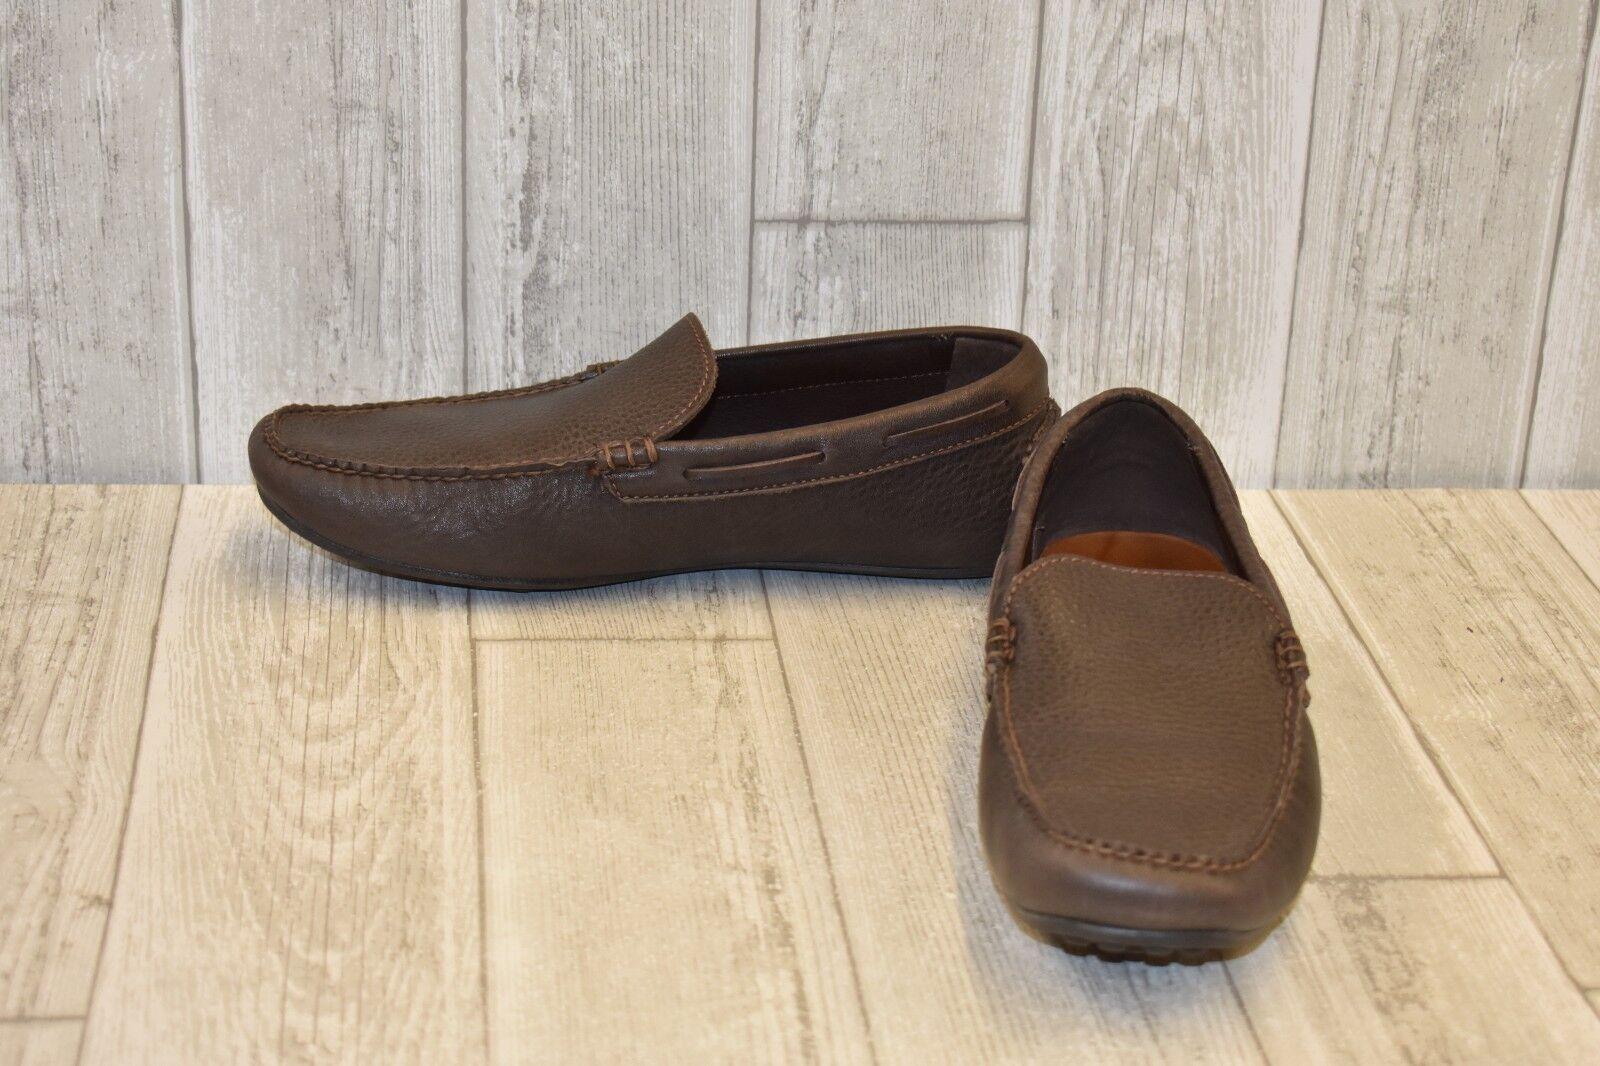 Frye Allen Venetian Loafer - Men's Size 9.5D - Brown